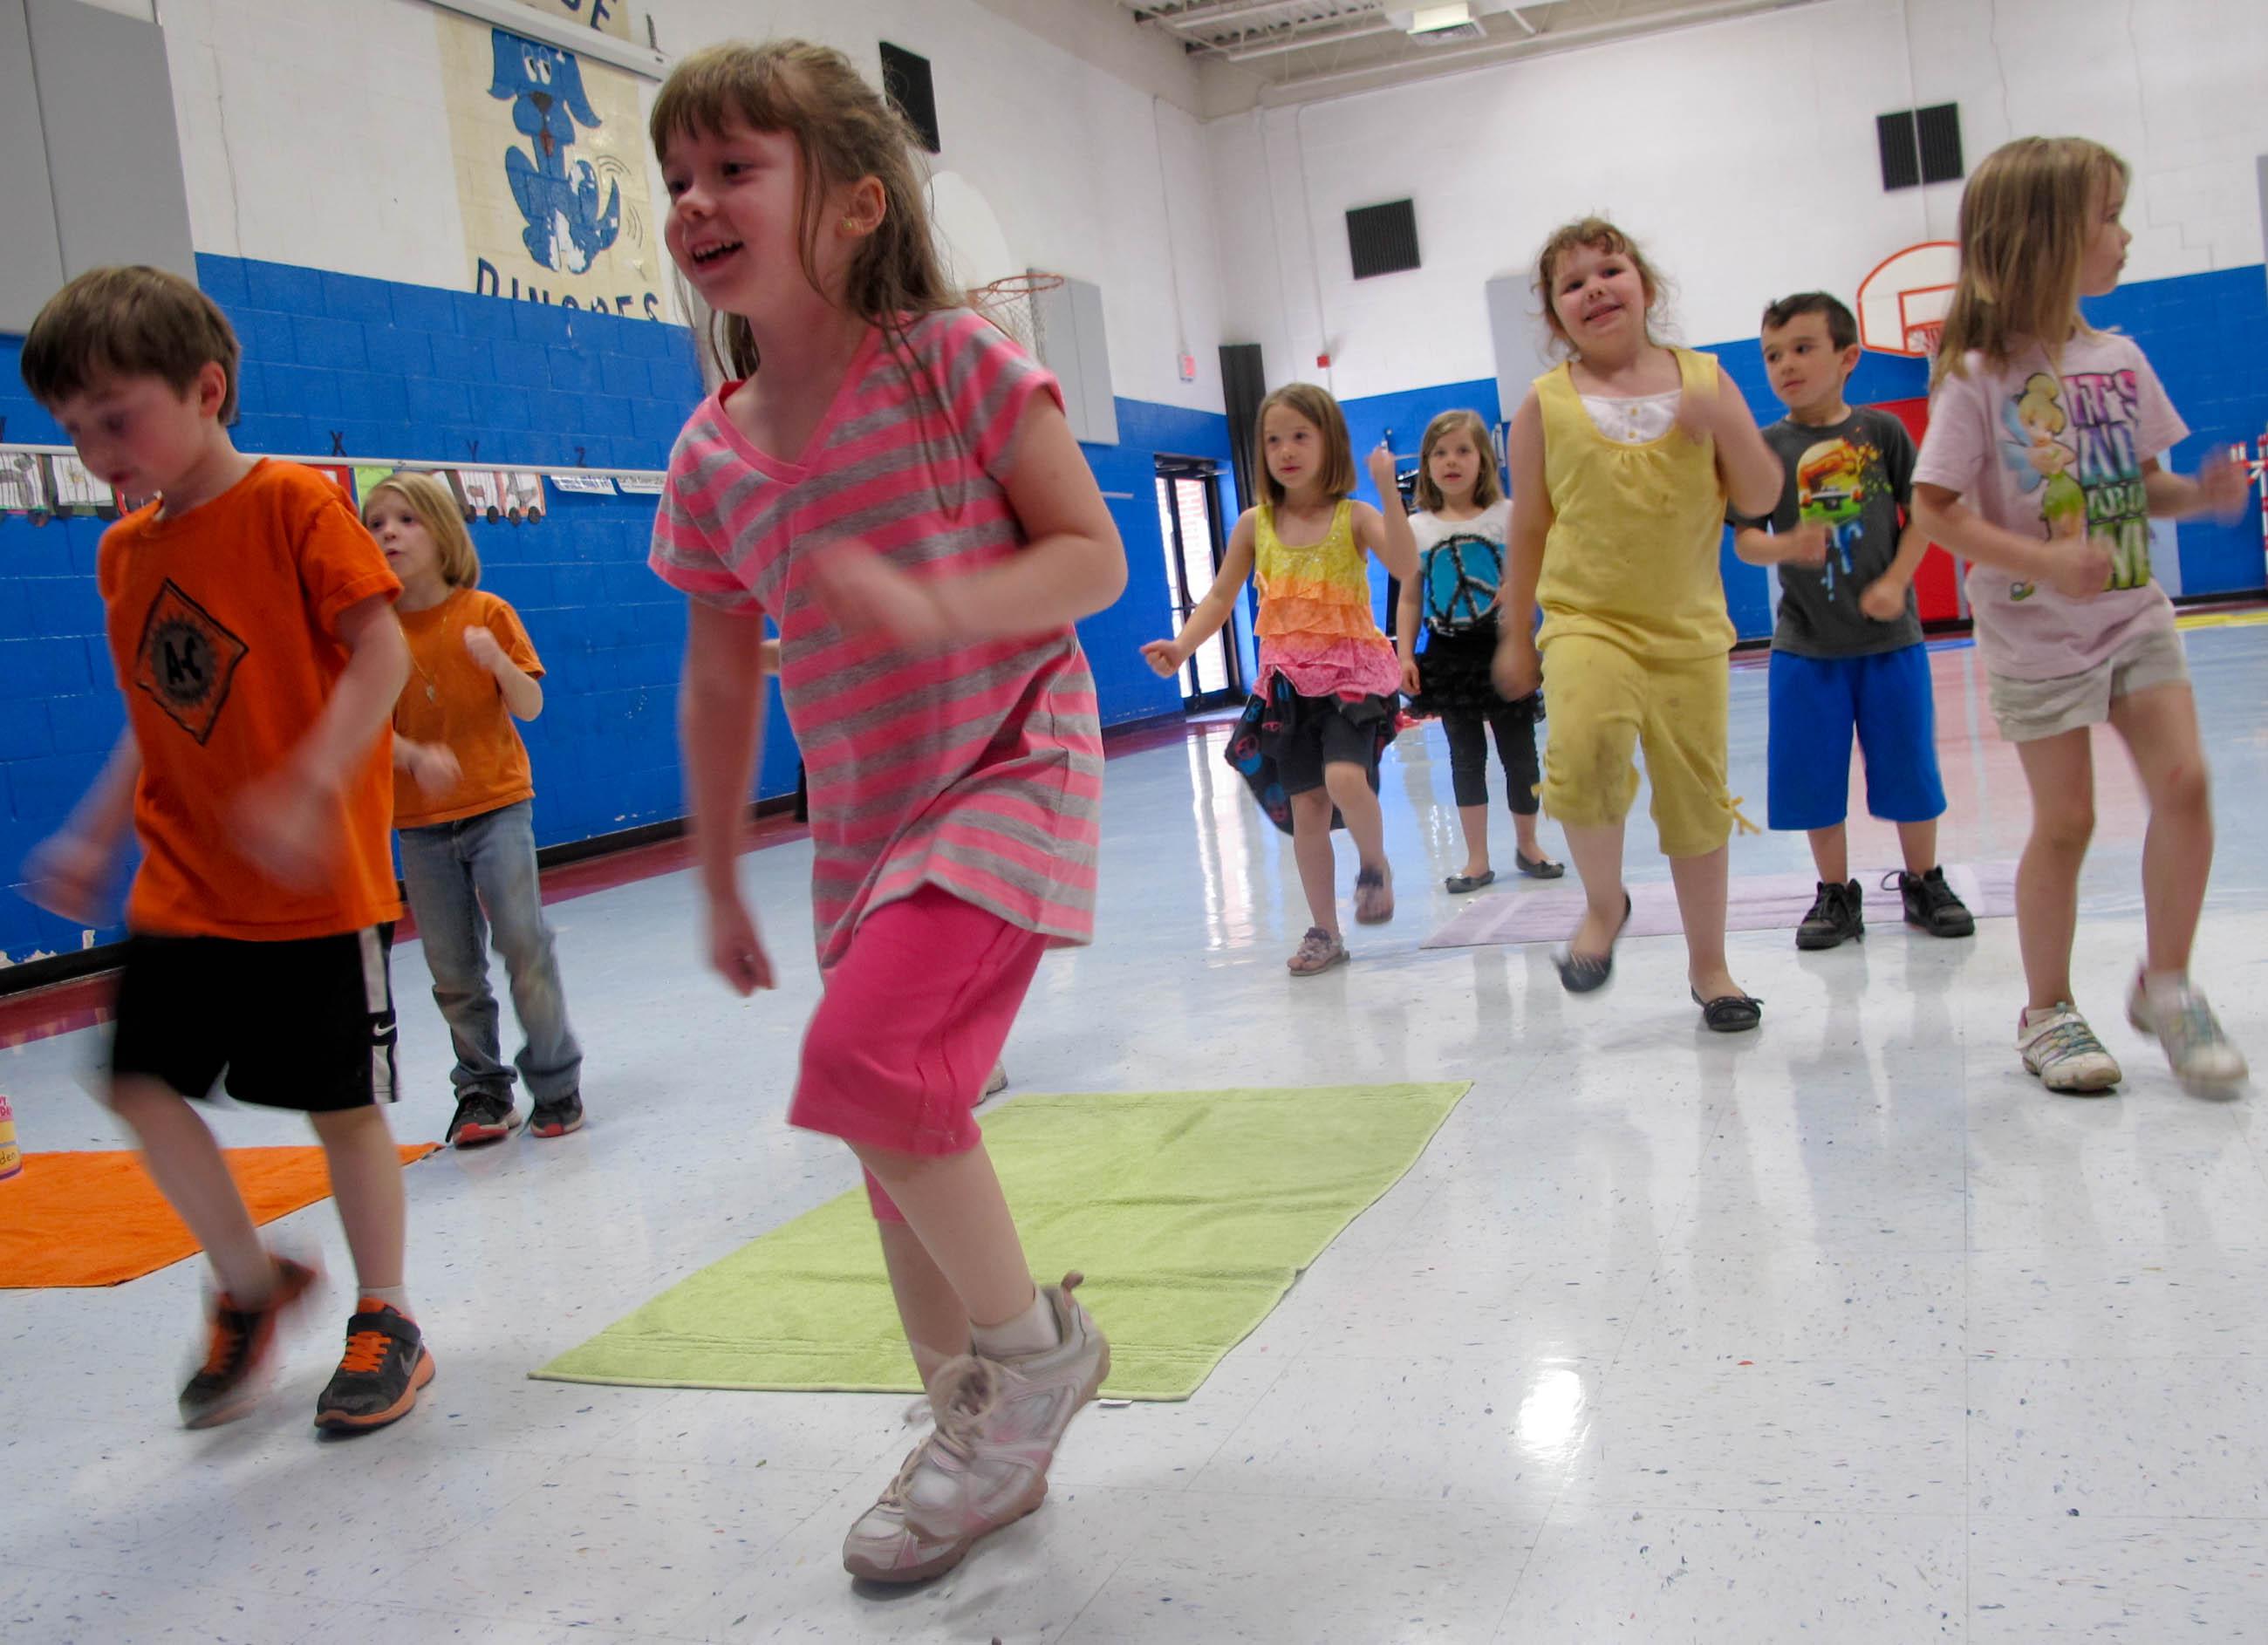 Gym Activities For Elementary School